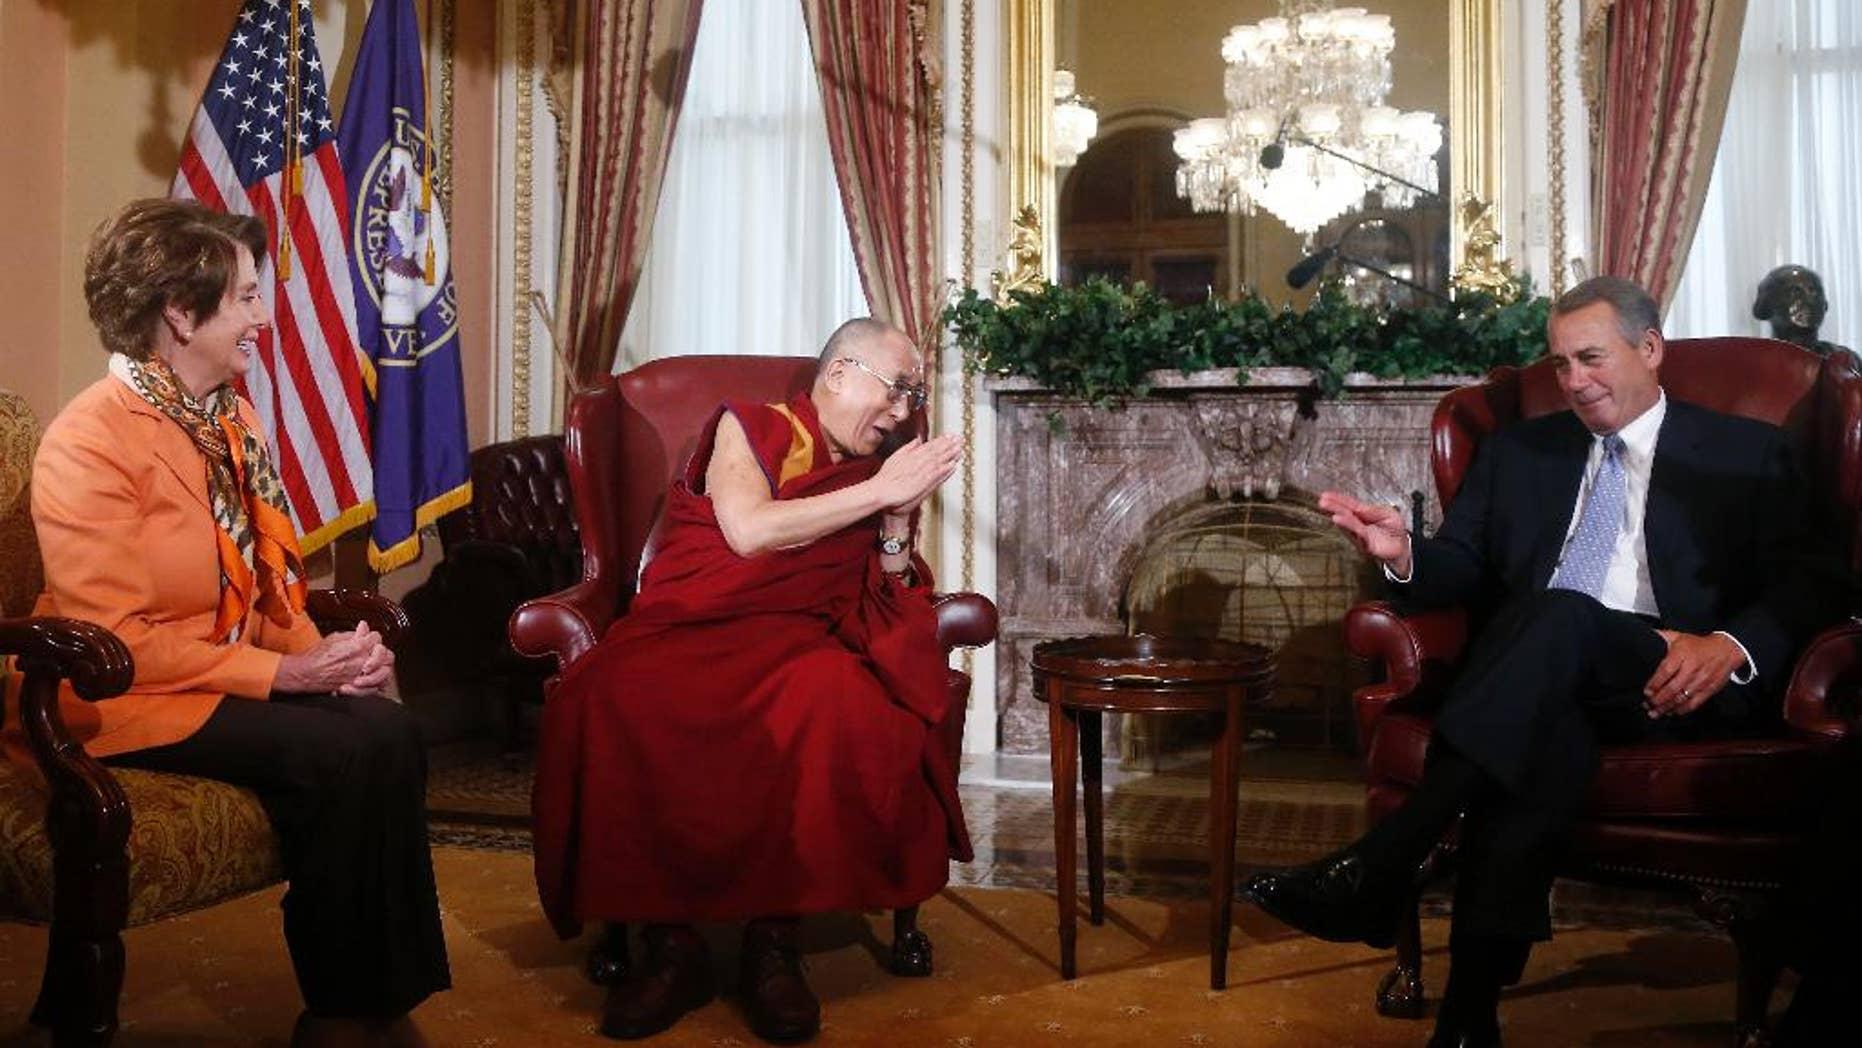 Tibetan spiritual leader the Dalai Lama meets with House Speaker John Boehner of Ohio and House Minority Leader Nancy Pelosi of Calif., on Capitol Hill in Washington, Thursday, March 6, 2014. (AP Photo/Charles Dharapak)